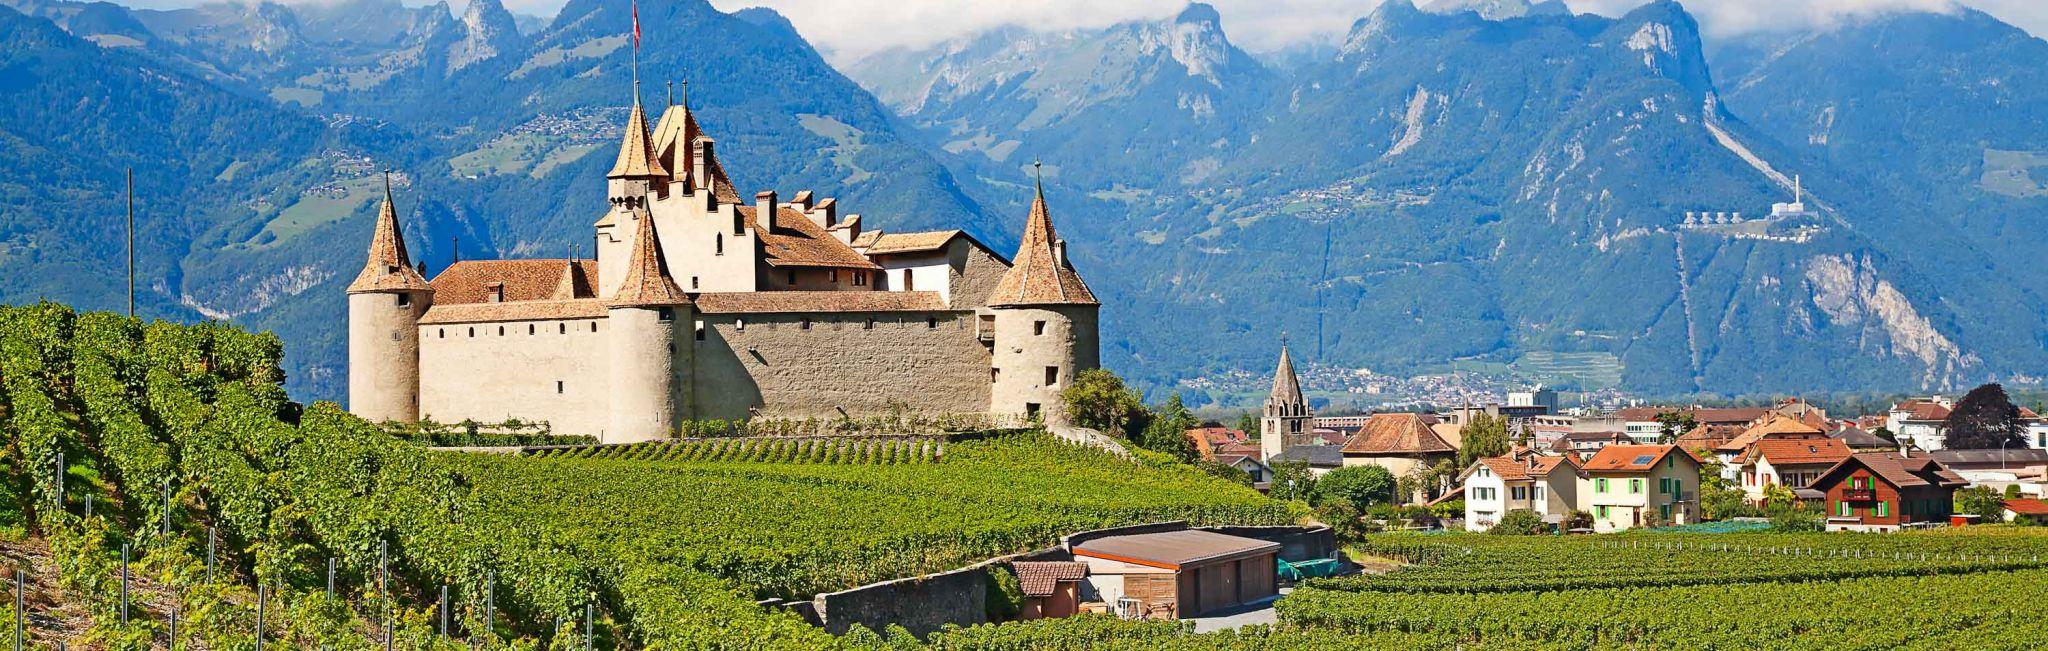 Luxury Switzerland Honeymoon Romantic Travel Amp Tours